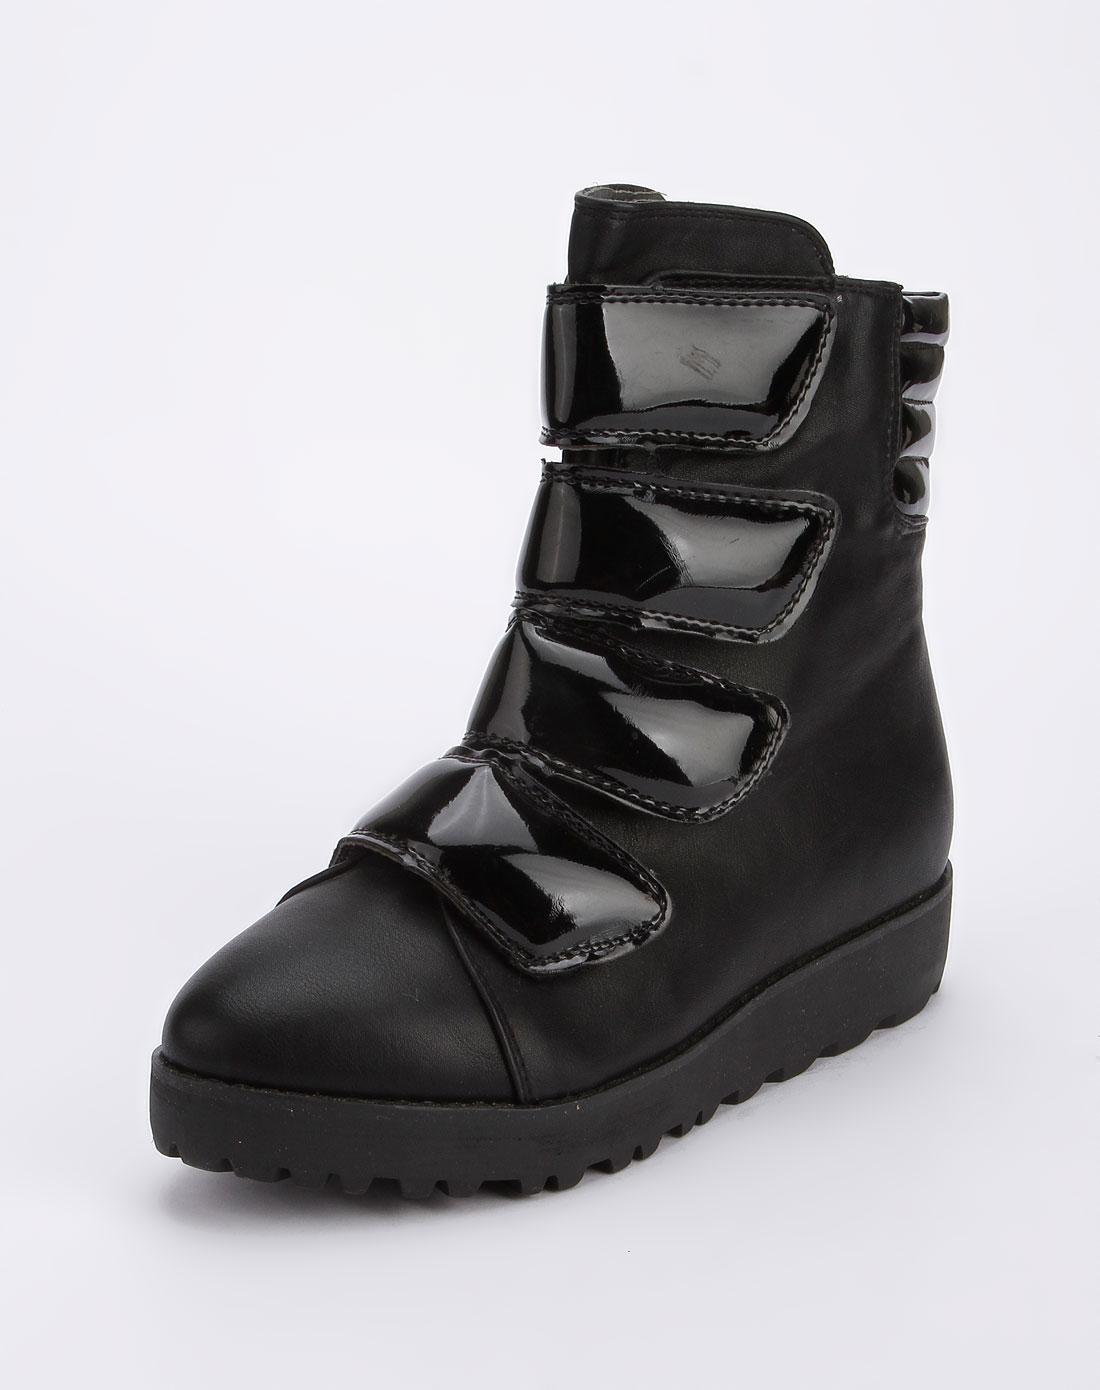 fasoli黑色侧拉链高帮休闲鞋s807-3-黑色